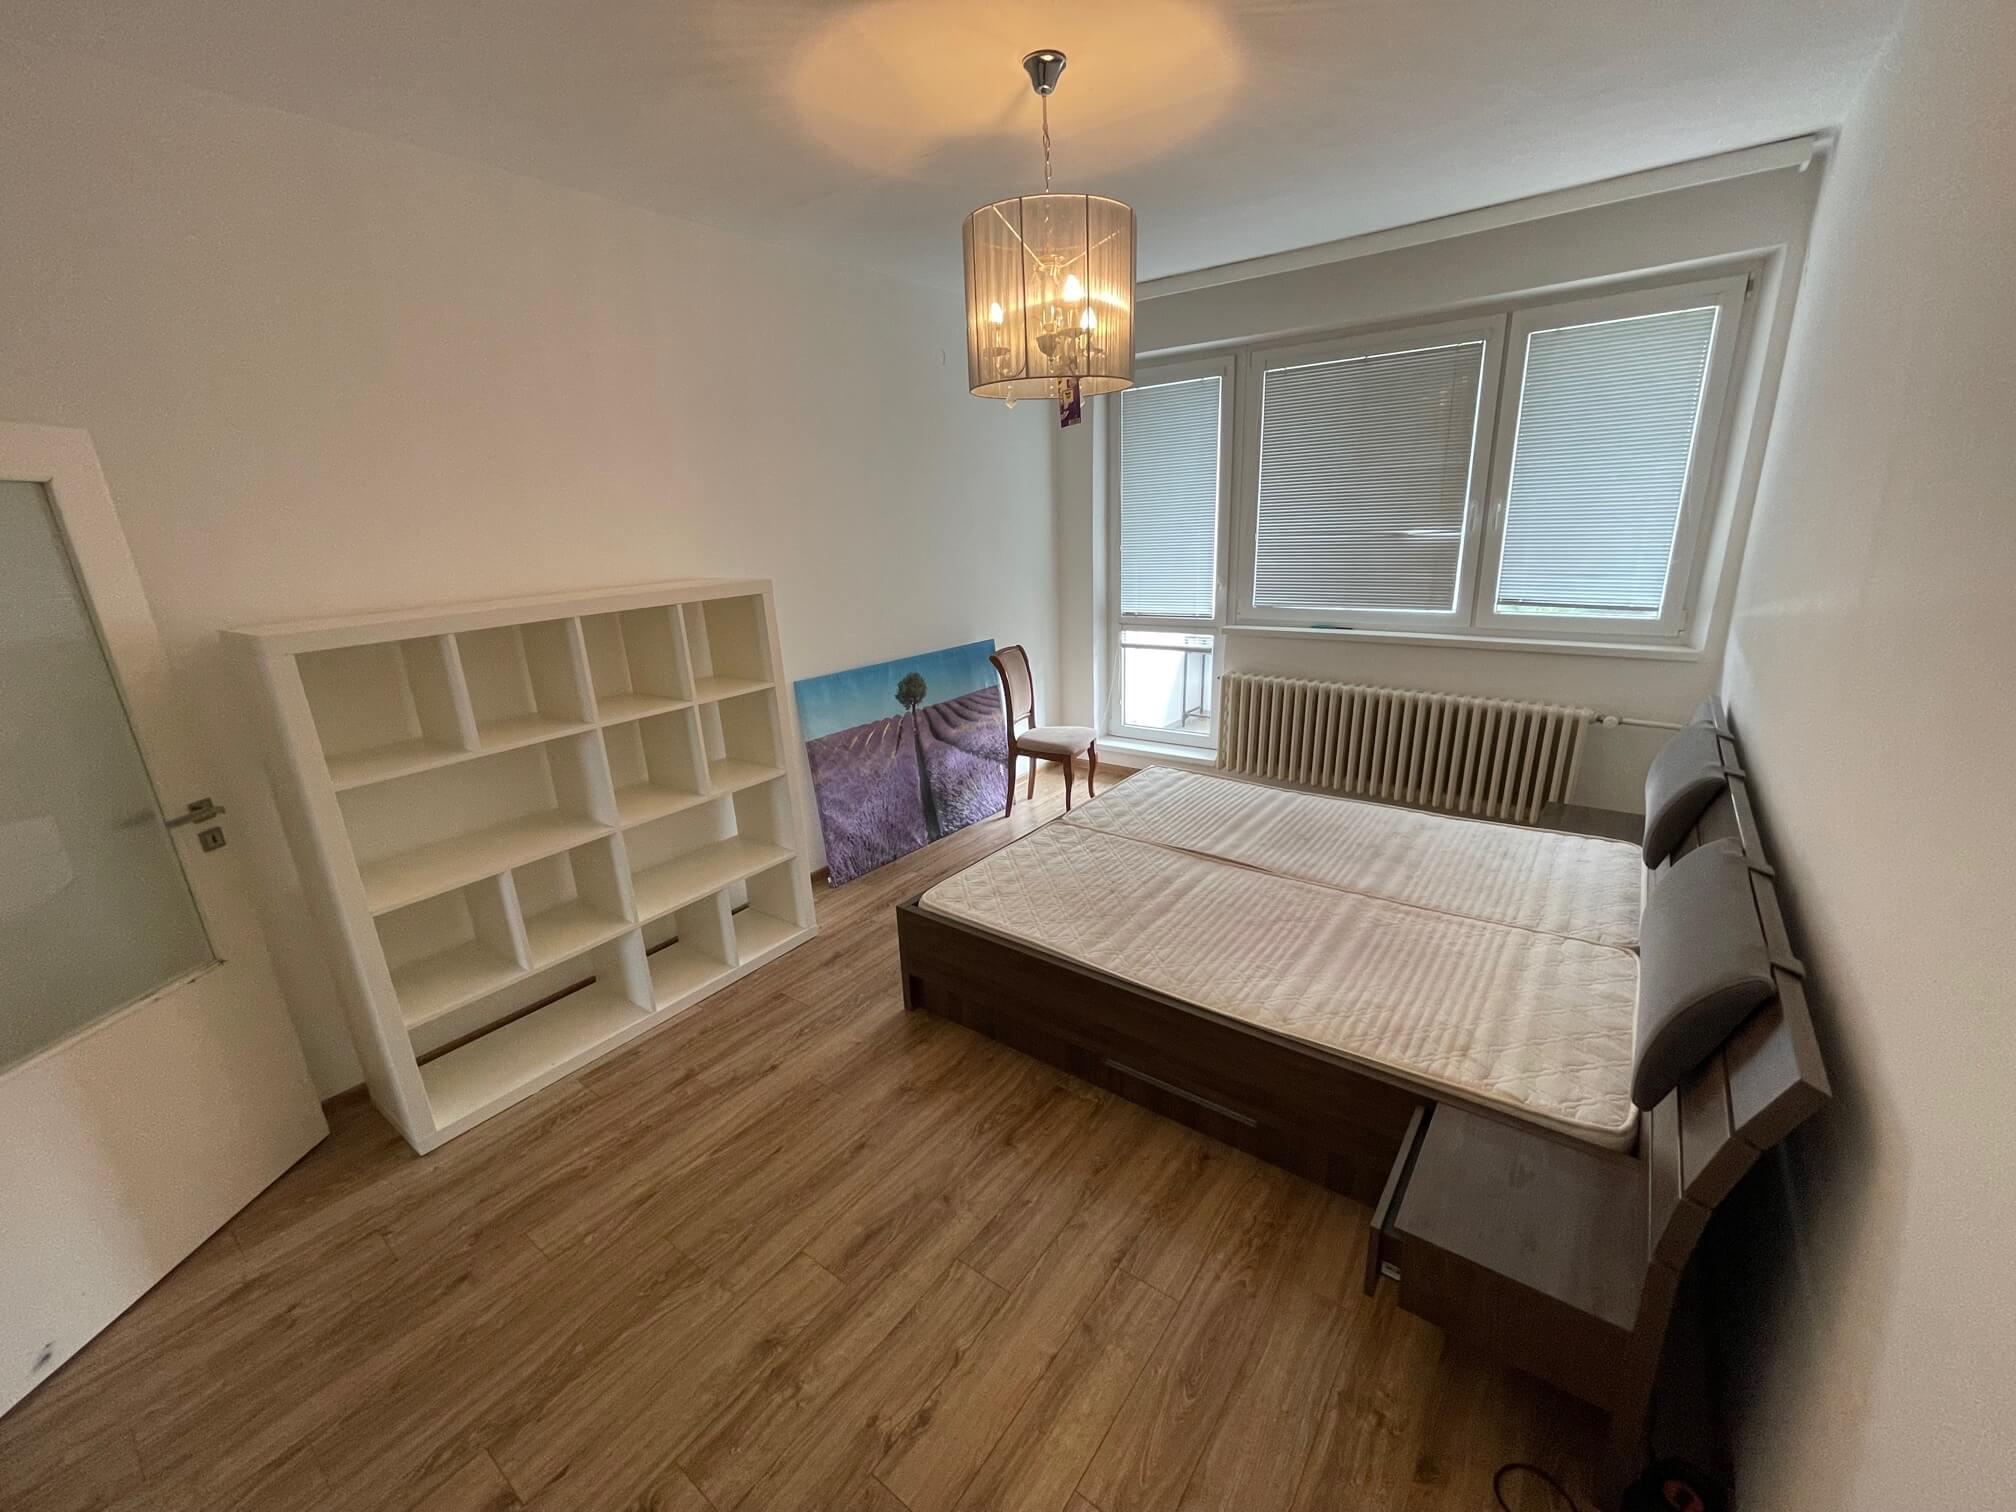 Exkluzívne na prenájom 3 izbový byt, 83m2, 2x loggia 4,5m2, Karolovka, Janotová 8-4